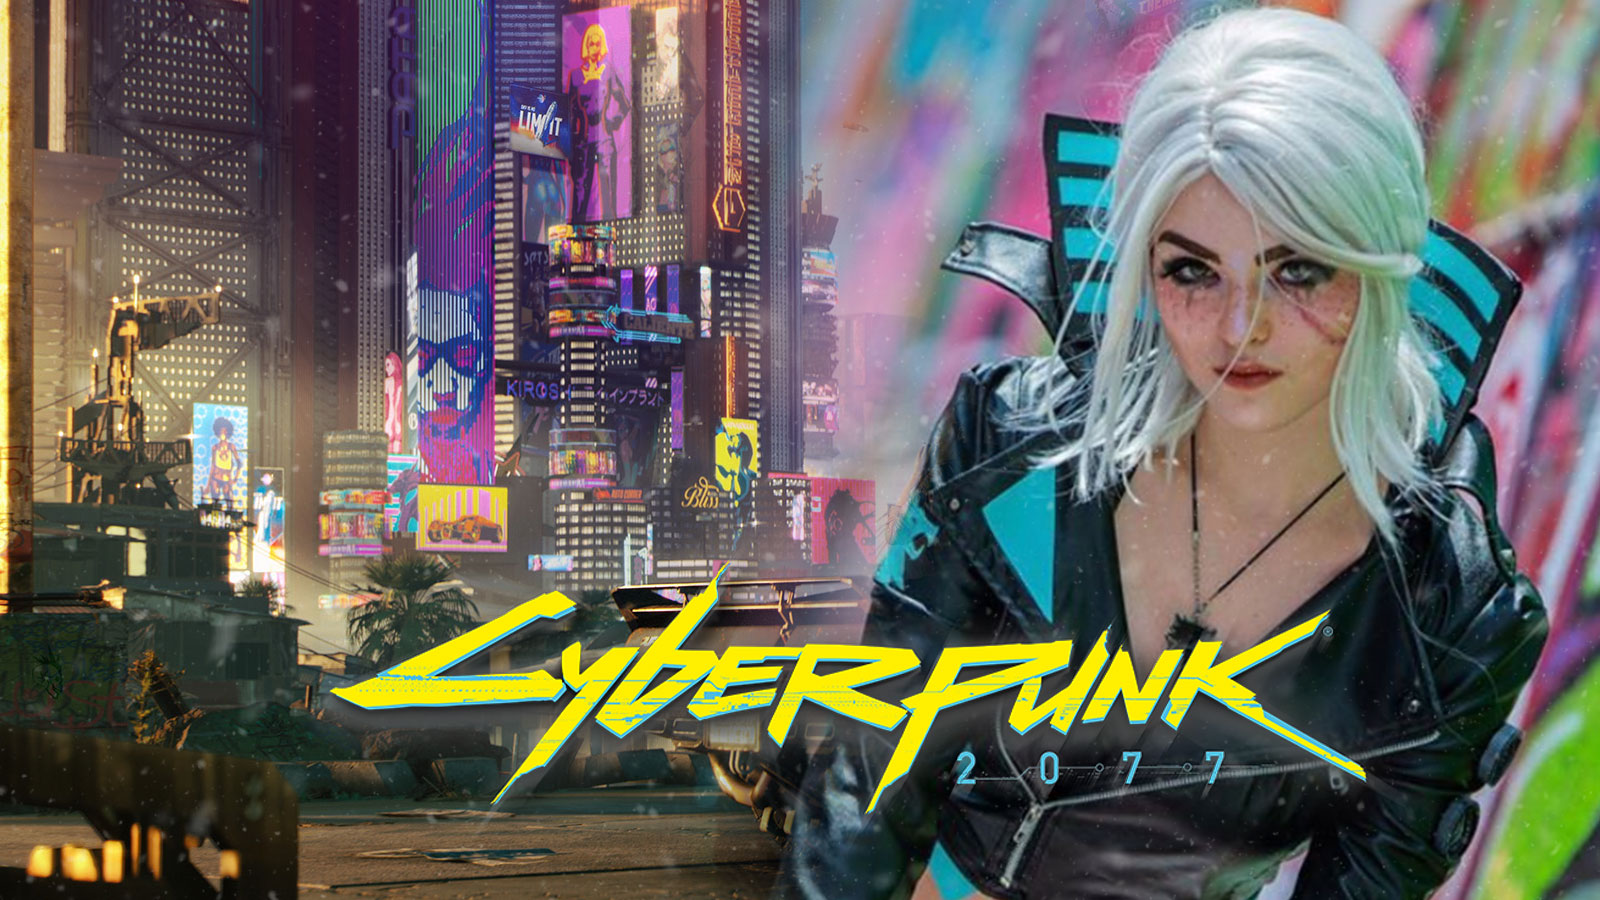 cyberpunk 2077 ciri cosplay witcher 3